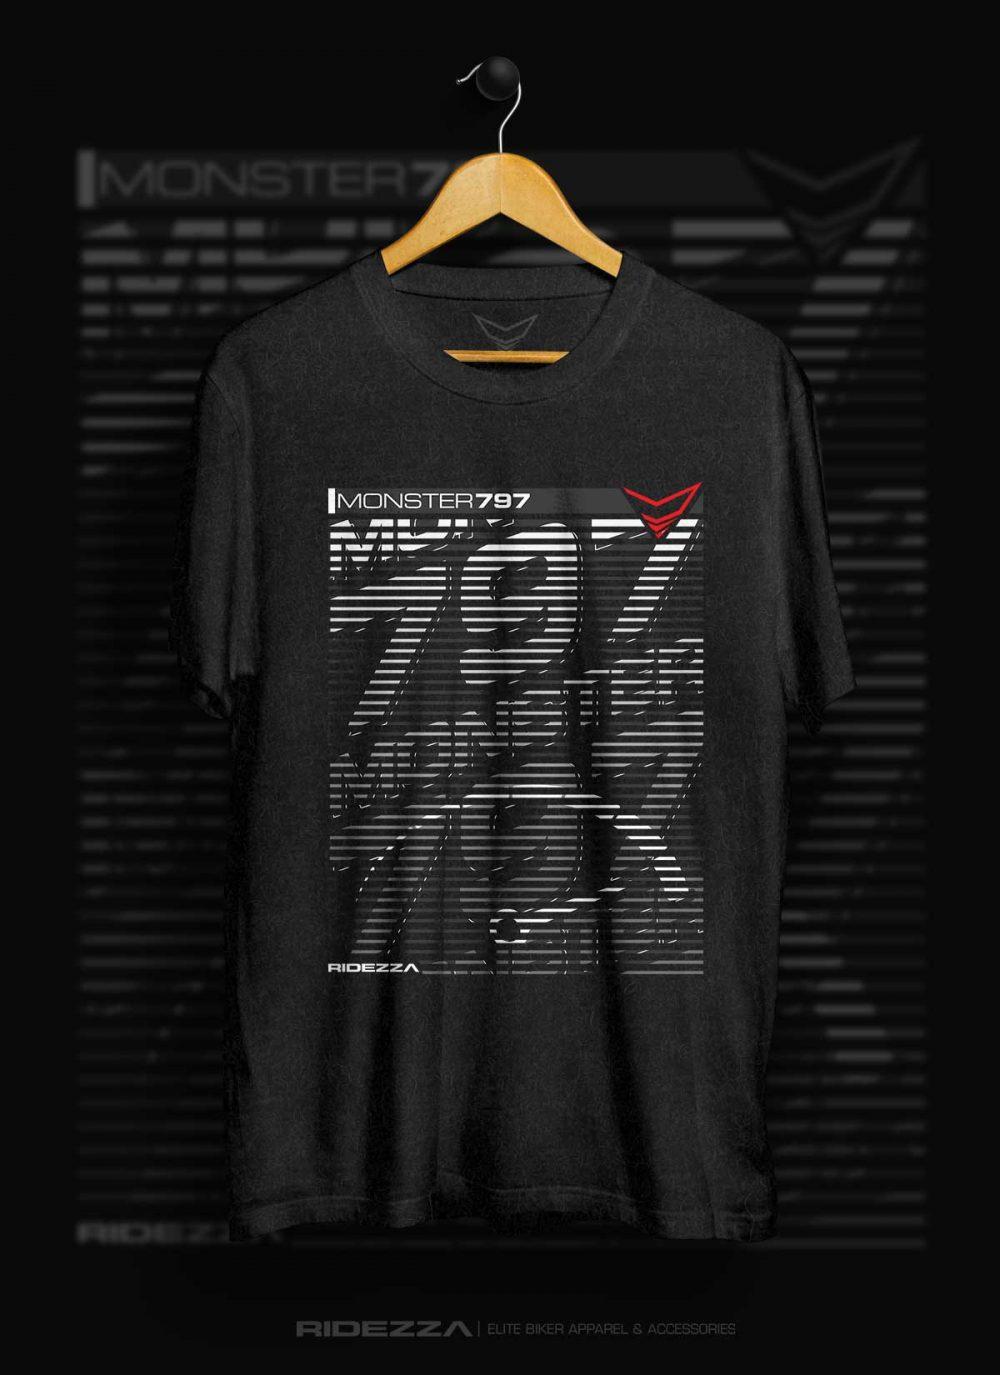 Ducati Monster 797 Speedy T-Shirt